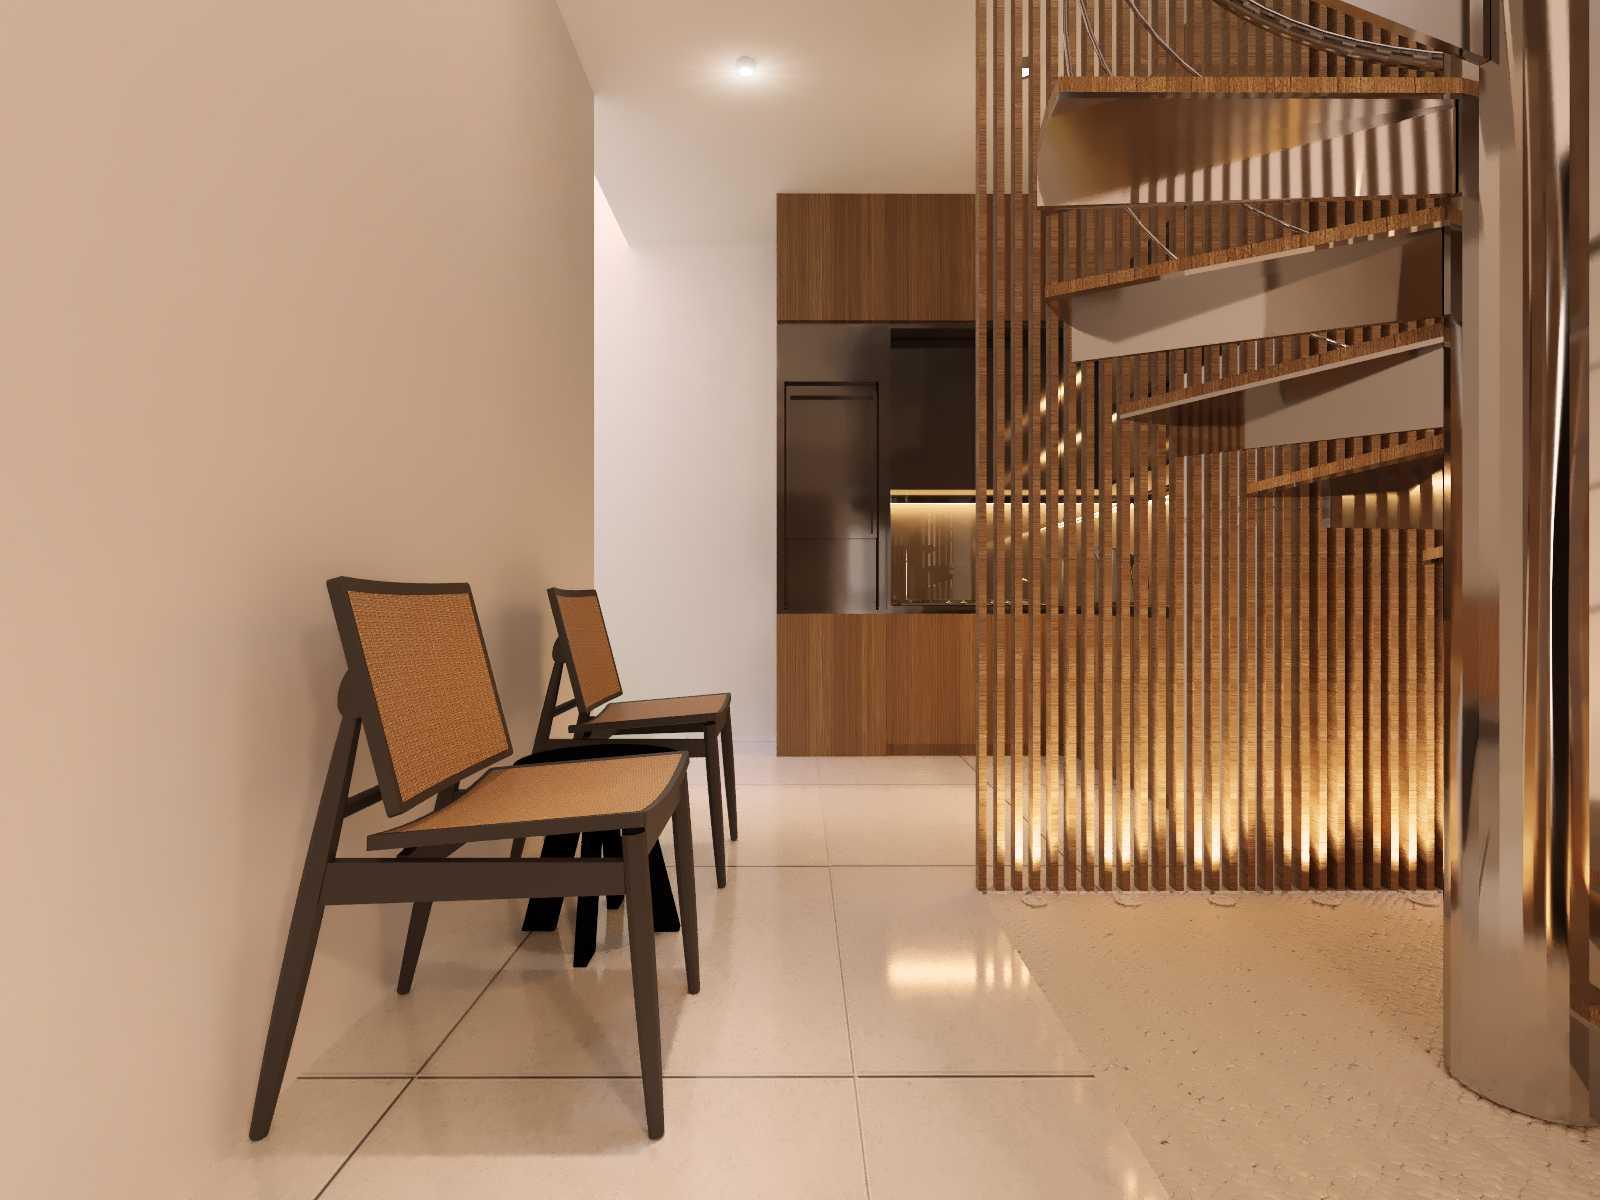 Mitrasasana - Design & Build Yg House Bekasi, Kota Bks, Jawa Barat, Indonesia Bekasi, Kota Bks, Jawa Barat, Indonesia Mitrasasana-Design-Build-Yg-House   78700